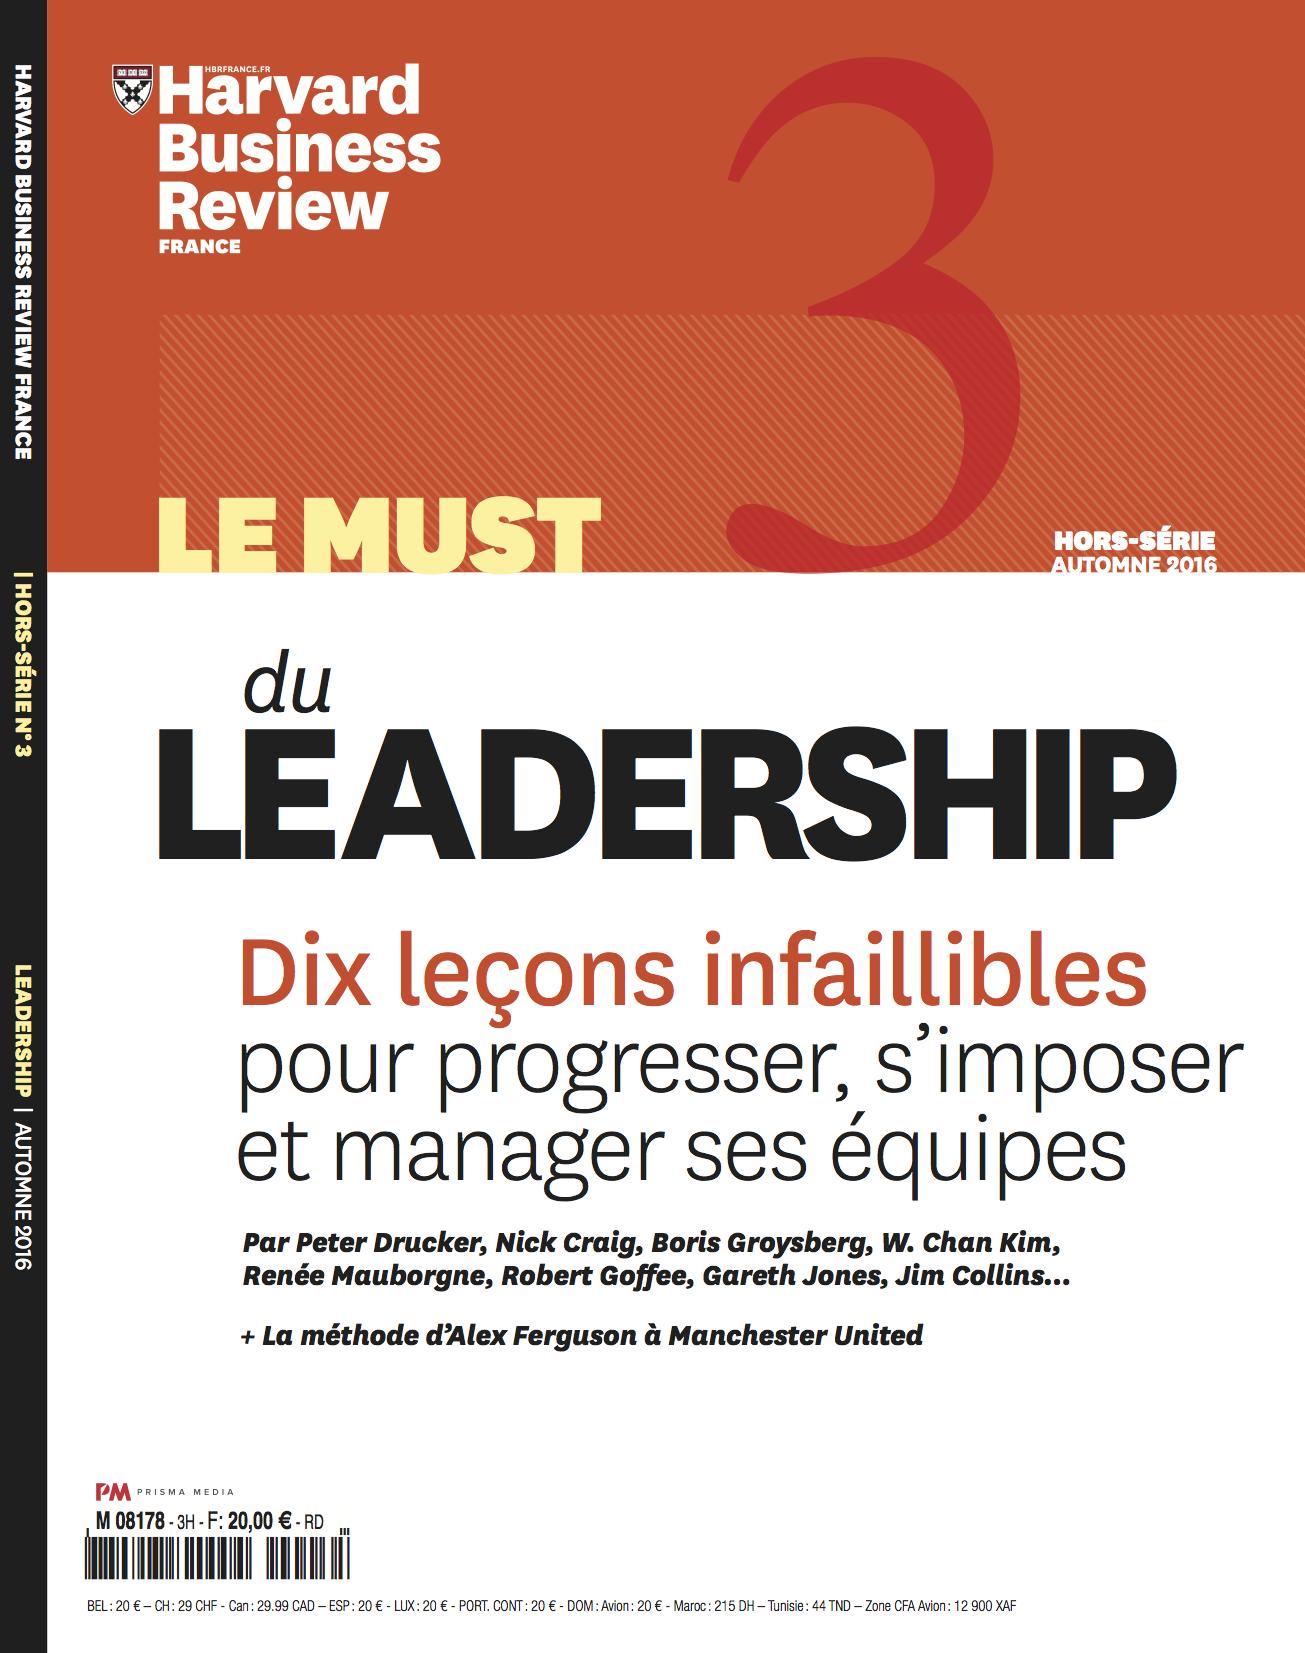 Le must du leadership